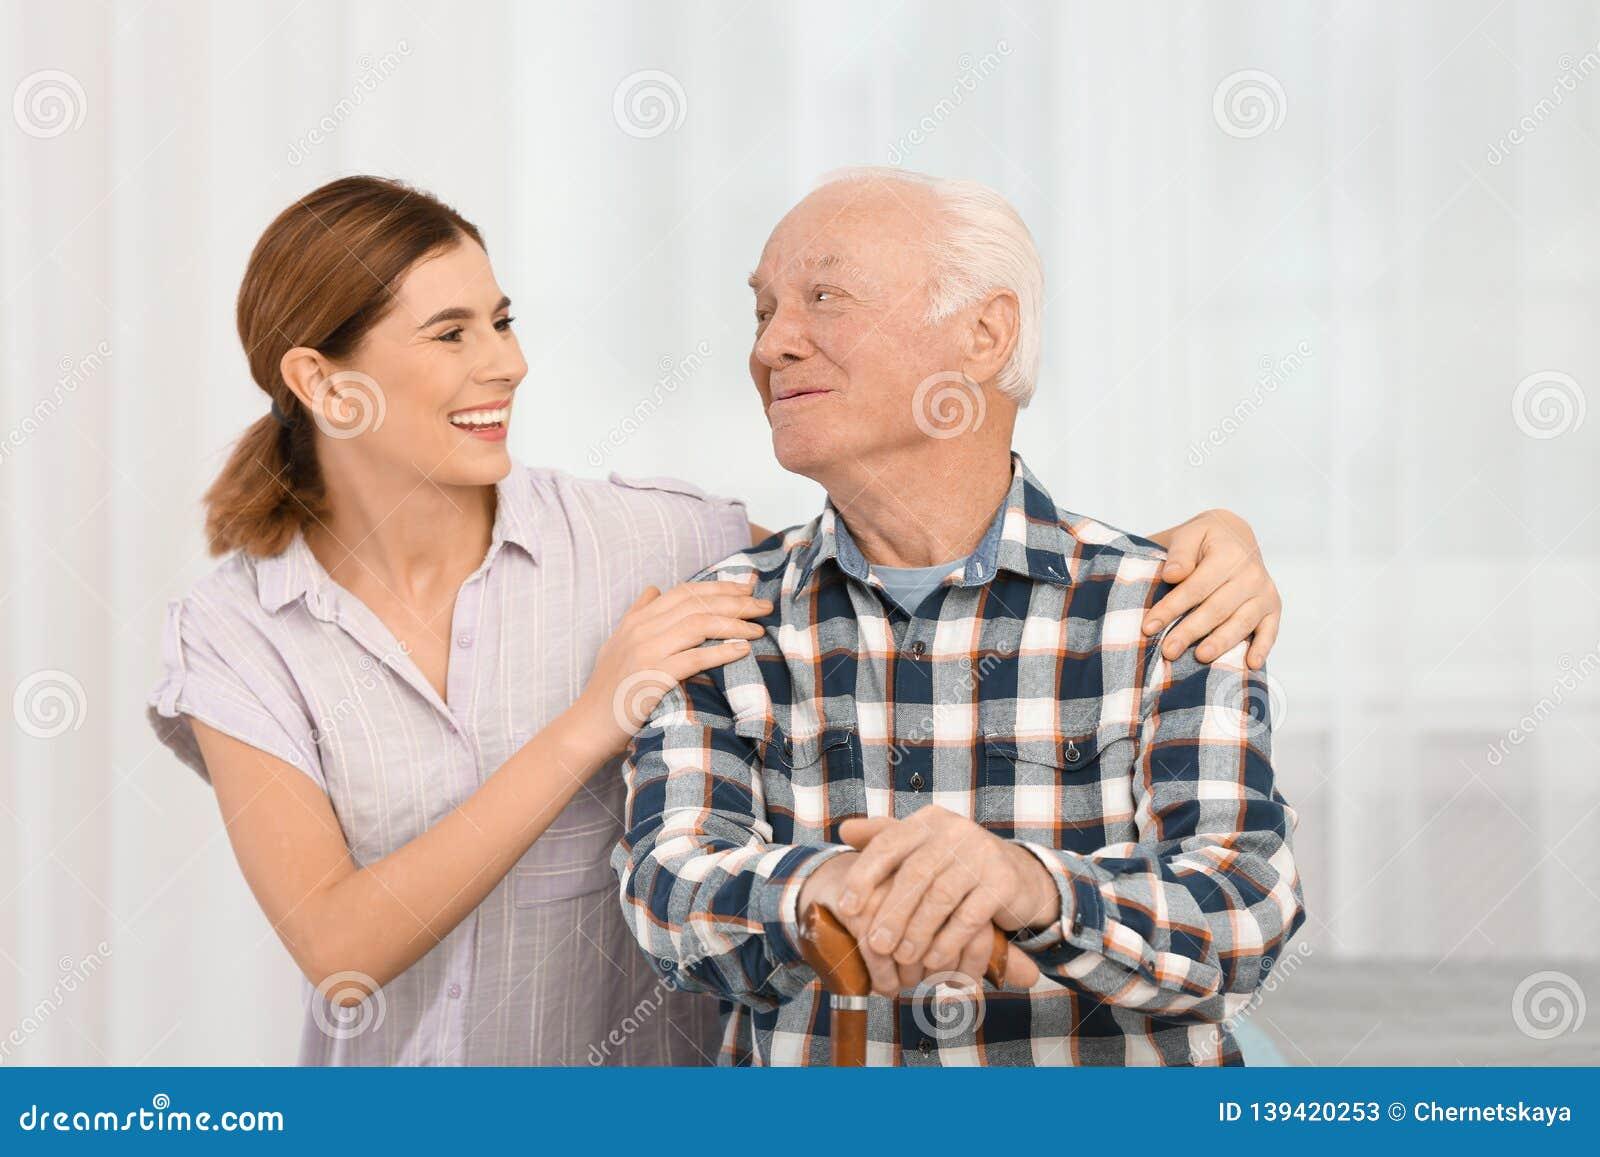 Elderly man with female caregiver